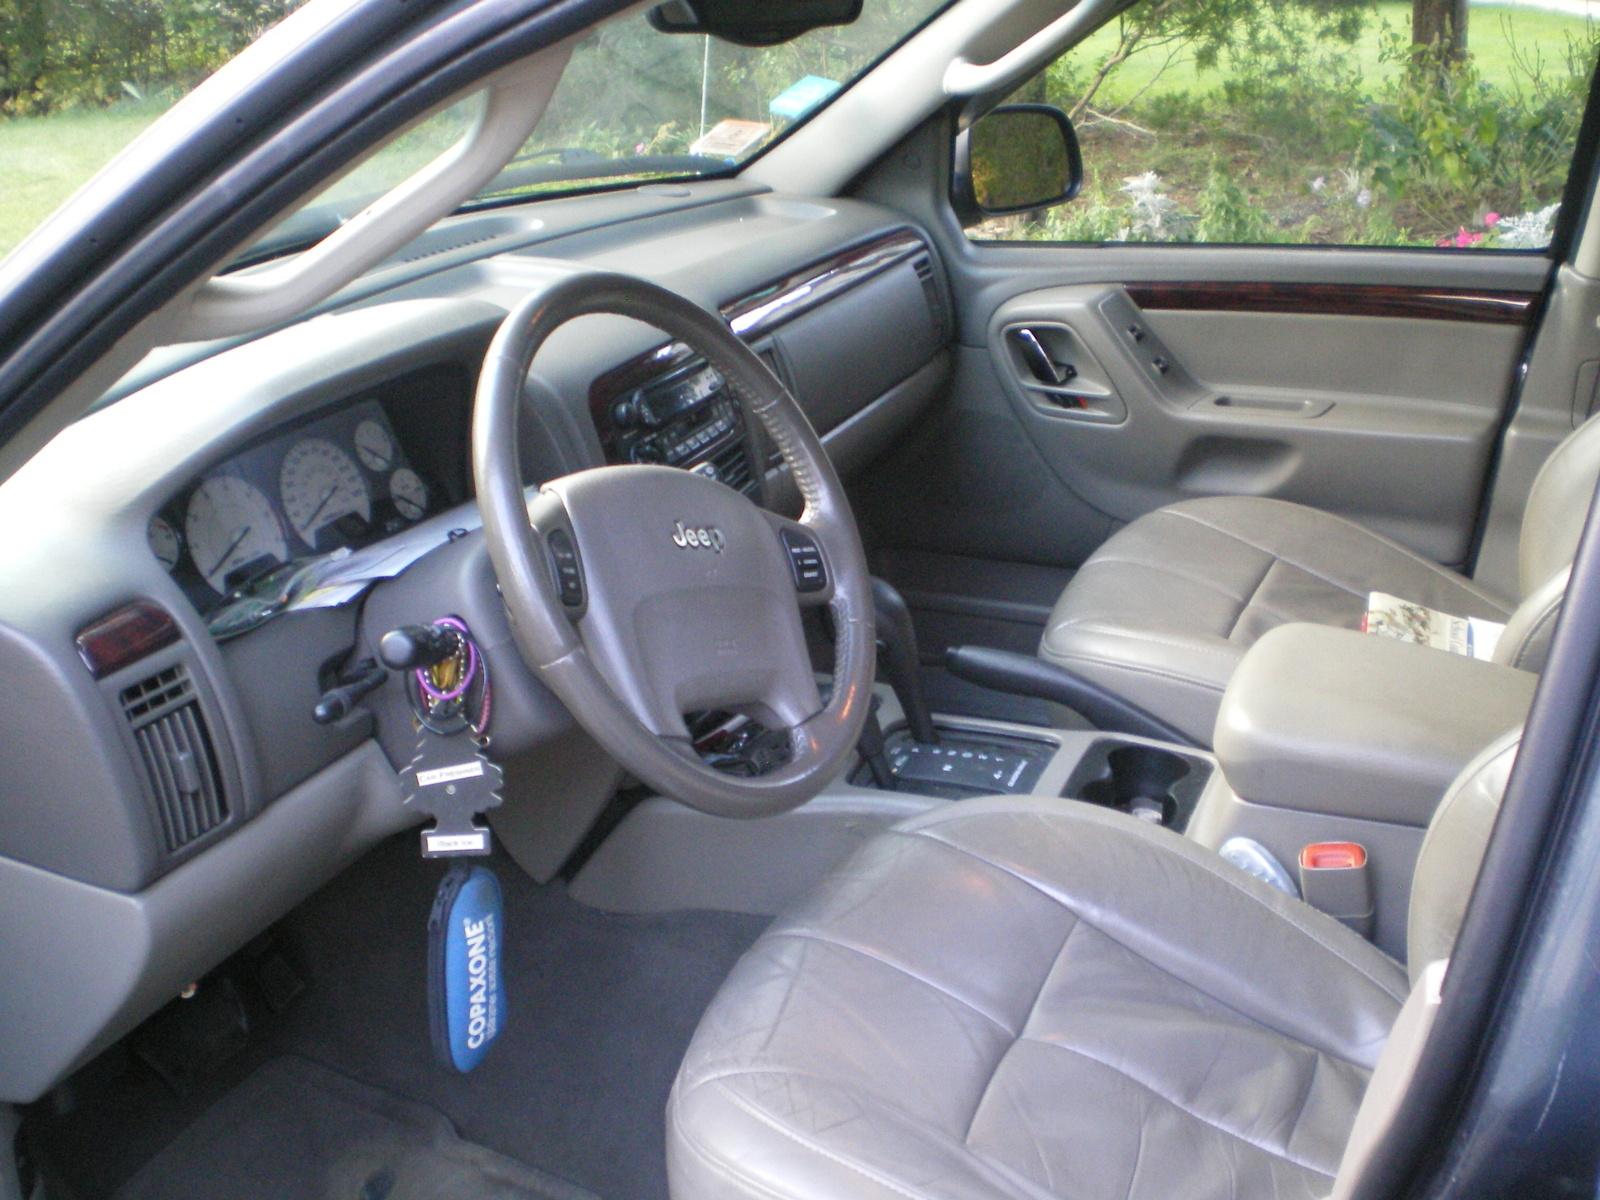 2004 jeep grand cherokee interior pictures cargurus for 2004 jeep grand cherokee interior